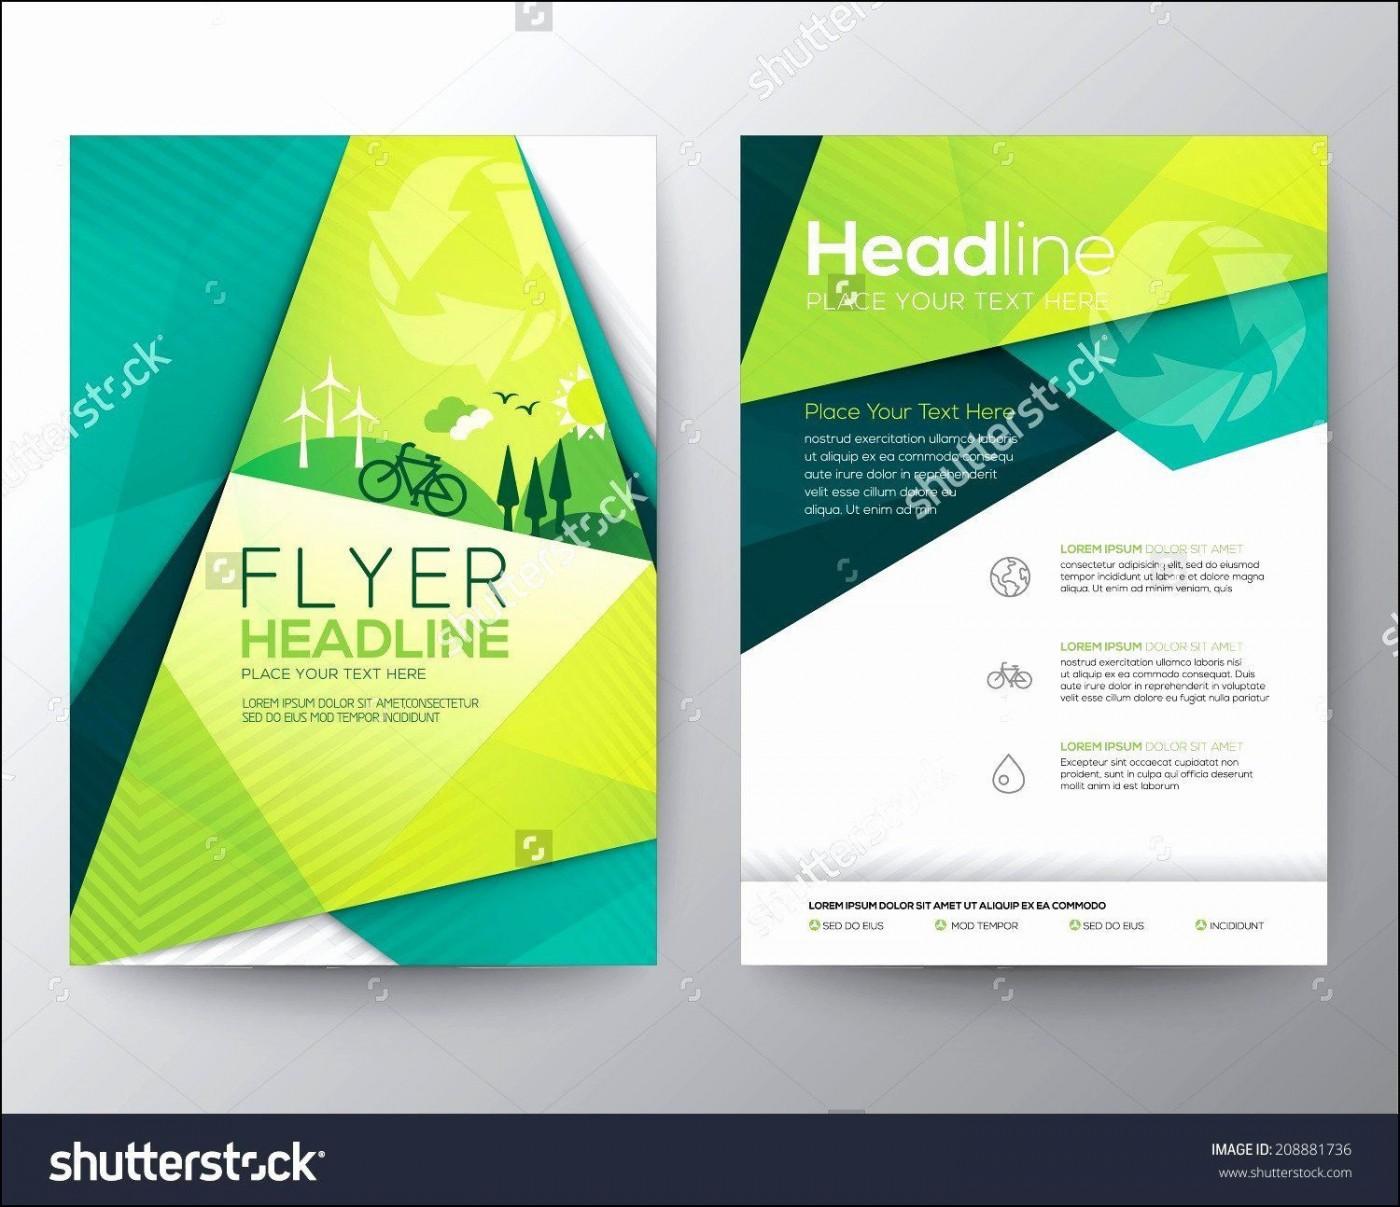 001 Impressive Photoshop Brochure Design Template Free Download Photo 1400